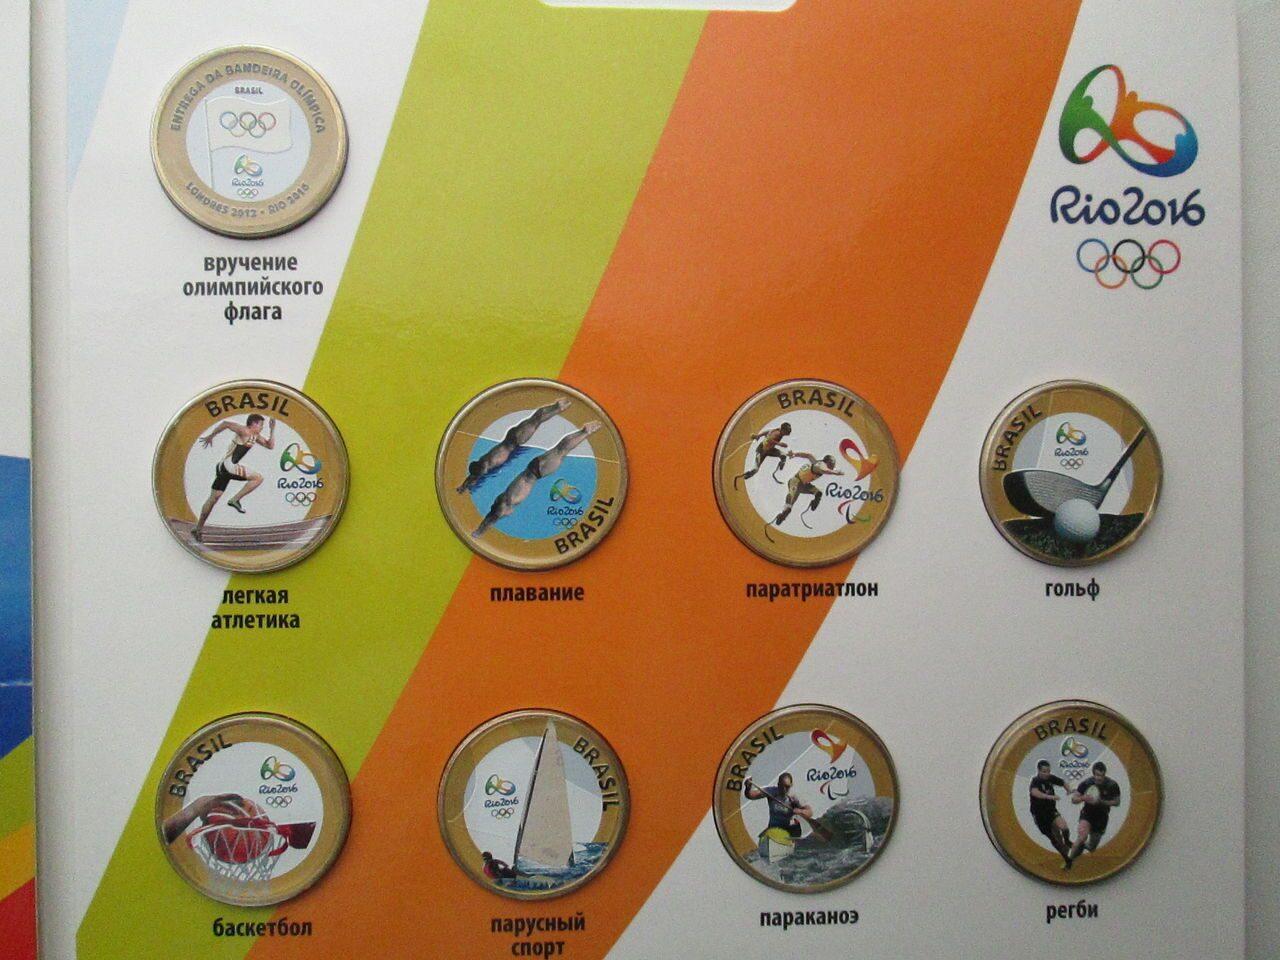 Набор монет олимпиада в бразилии цена юбилейных десятирублевых монет